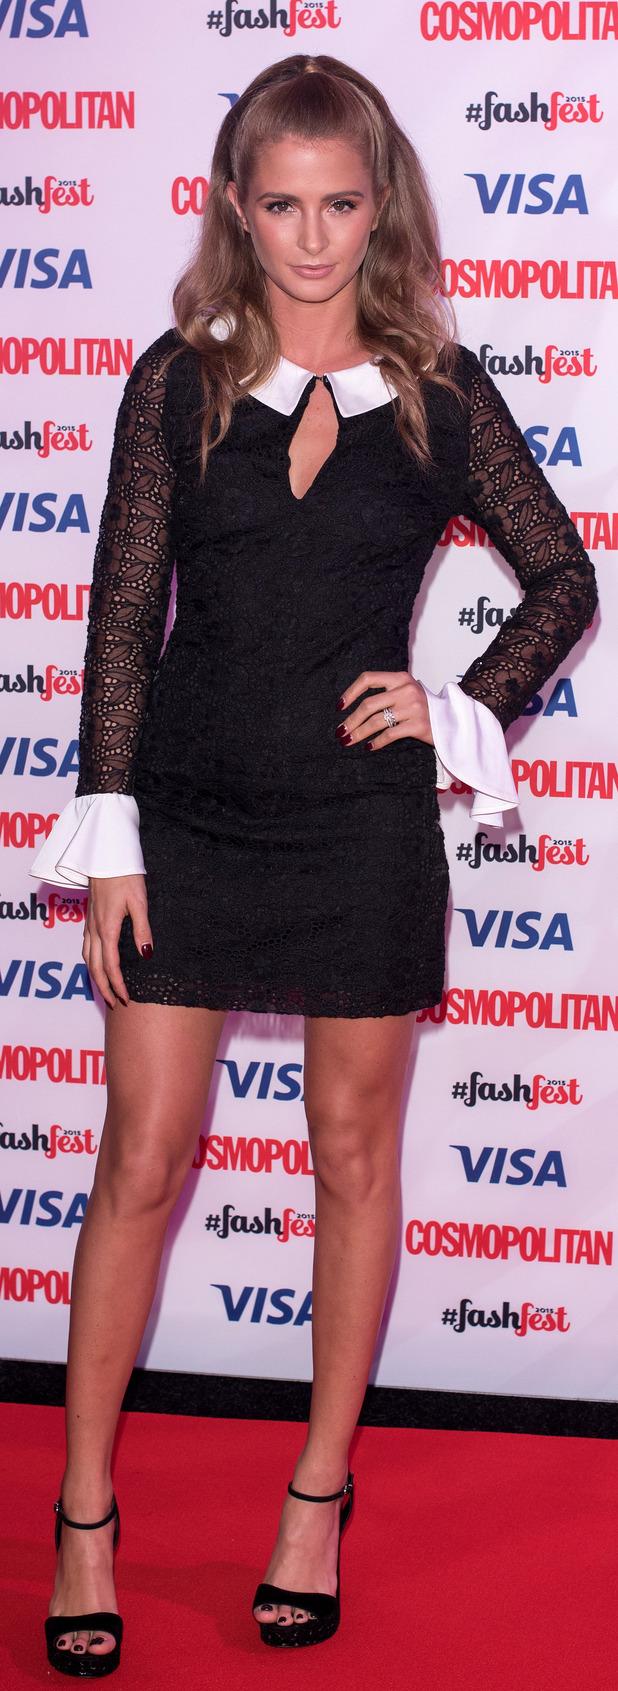 Millie Mackintosh at the Cosmopolitan FashFest, 18th September 2015